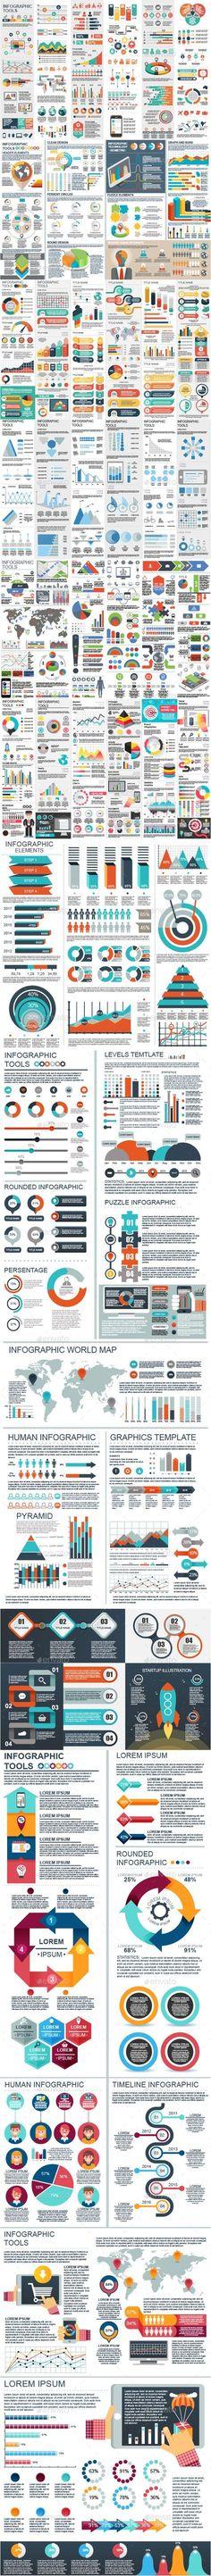 #Bundle Infographic Elements - #Infographics Download here: https://graphicriver.net/item/bundle-infographic-elements/20302511?ref=alena994